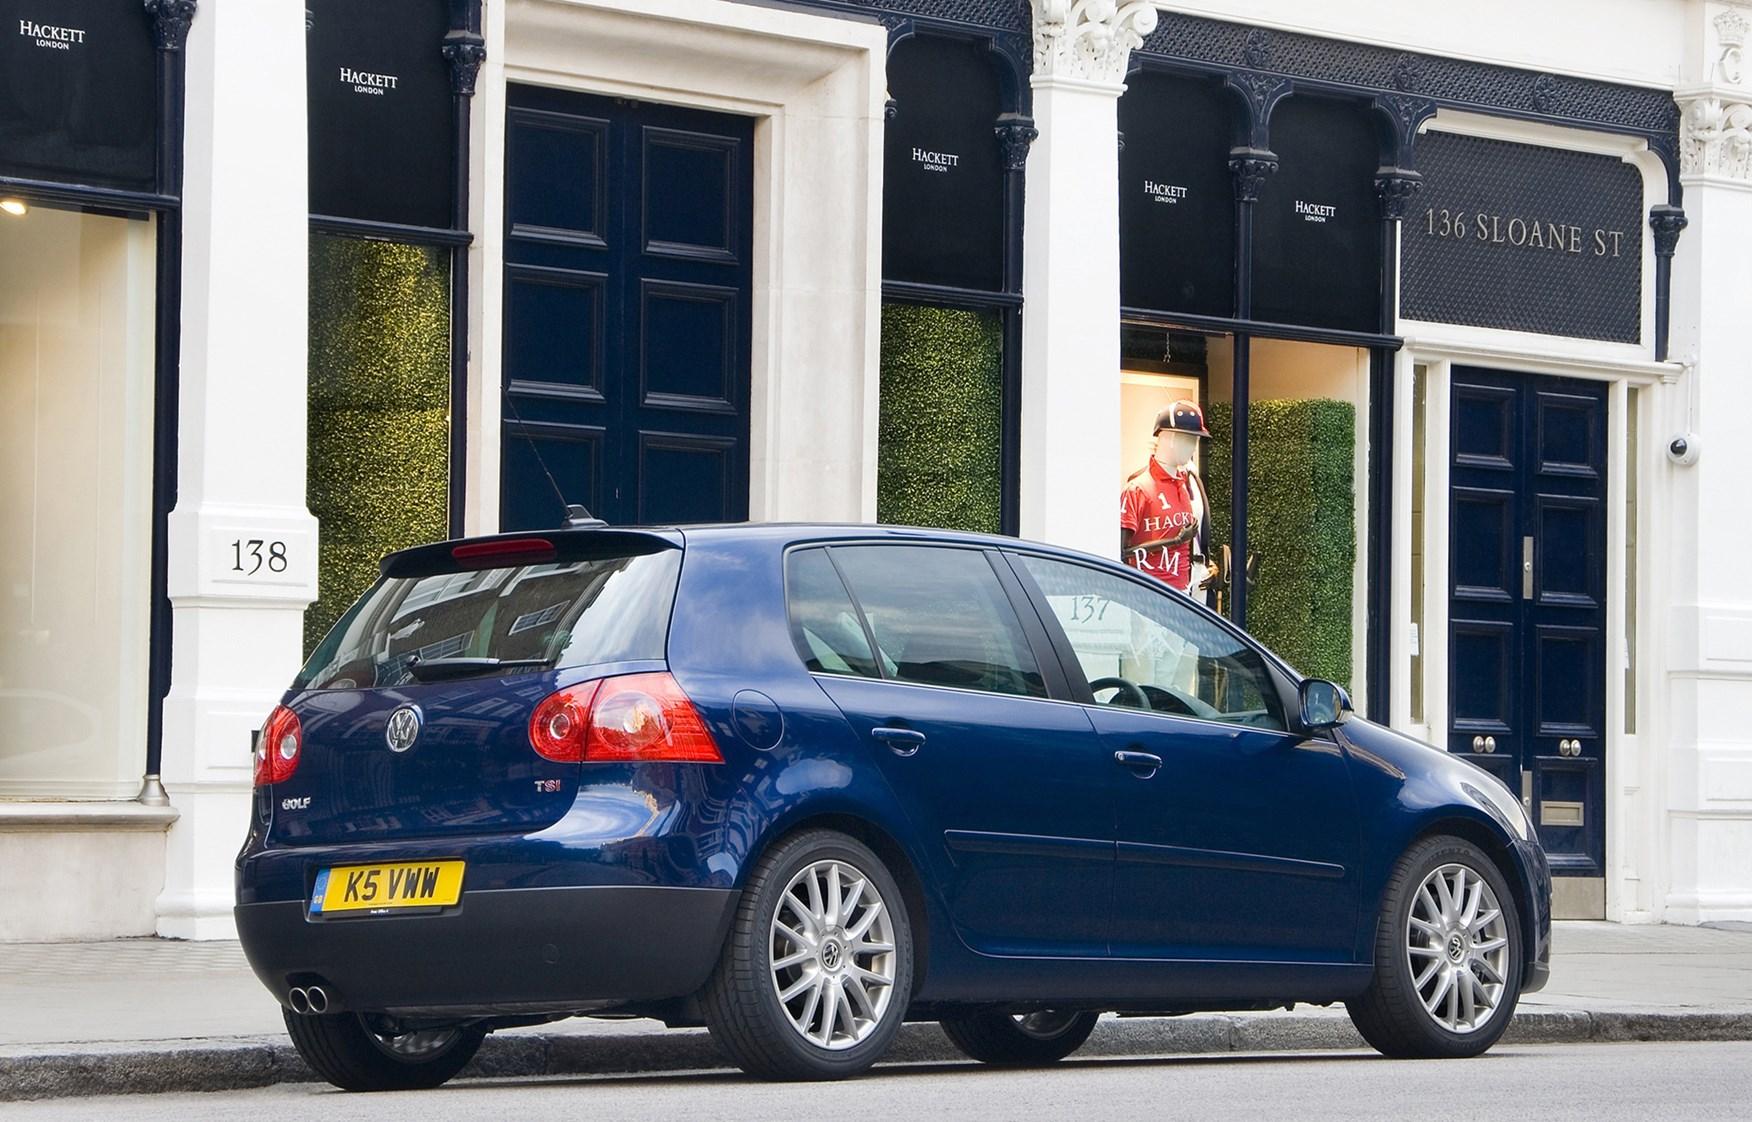 Used Volkswagen Golf Hatchback (2004 - 2008) Practicality | Parkers